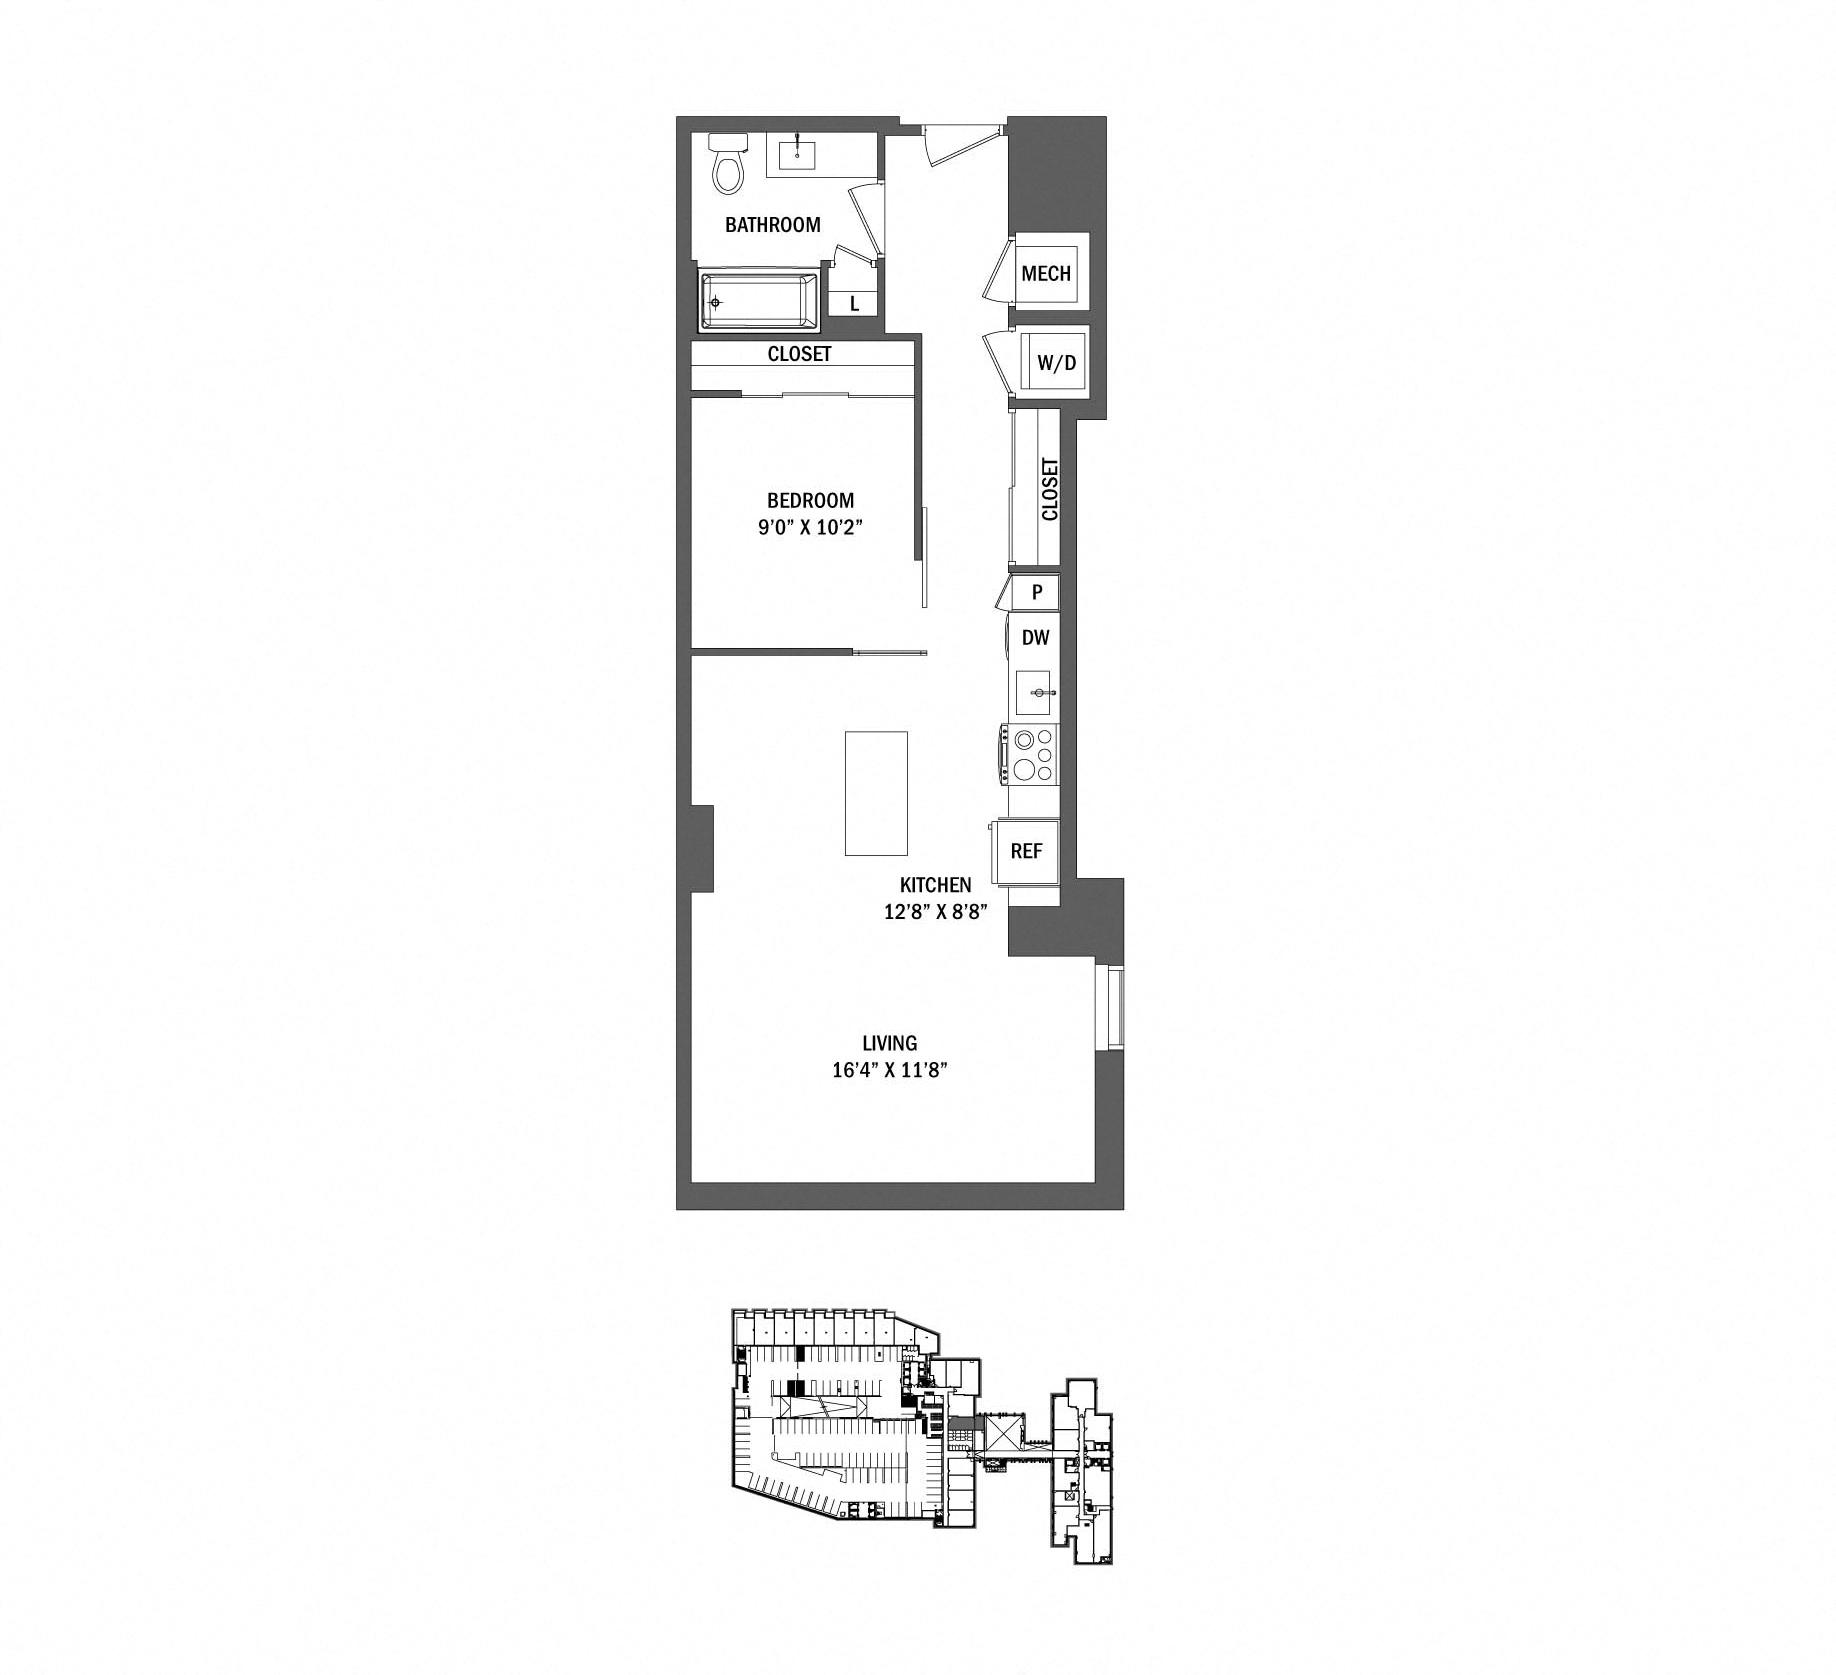 P0625338 s05 02 2 floorplan